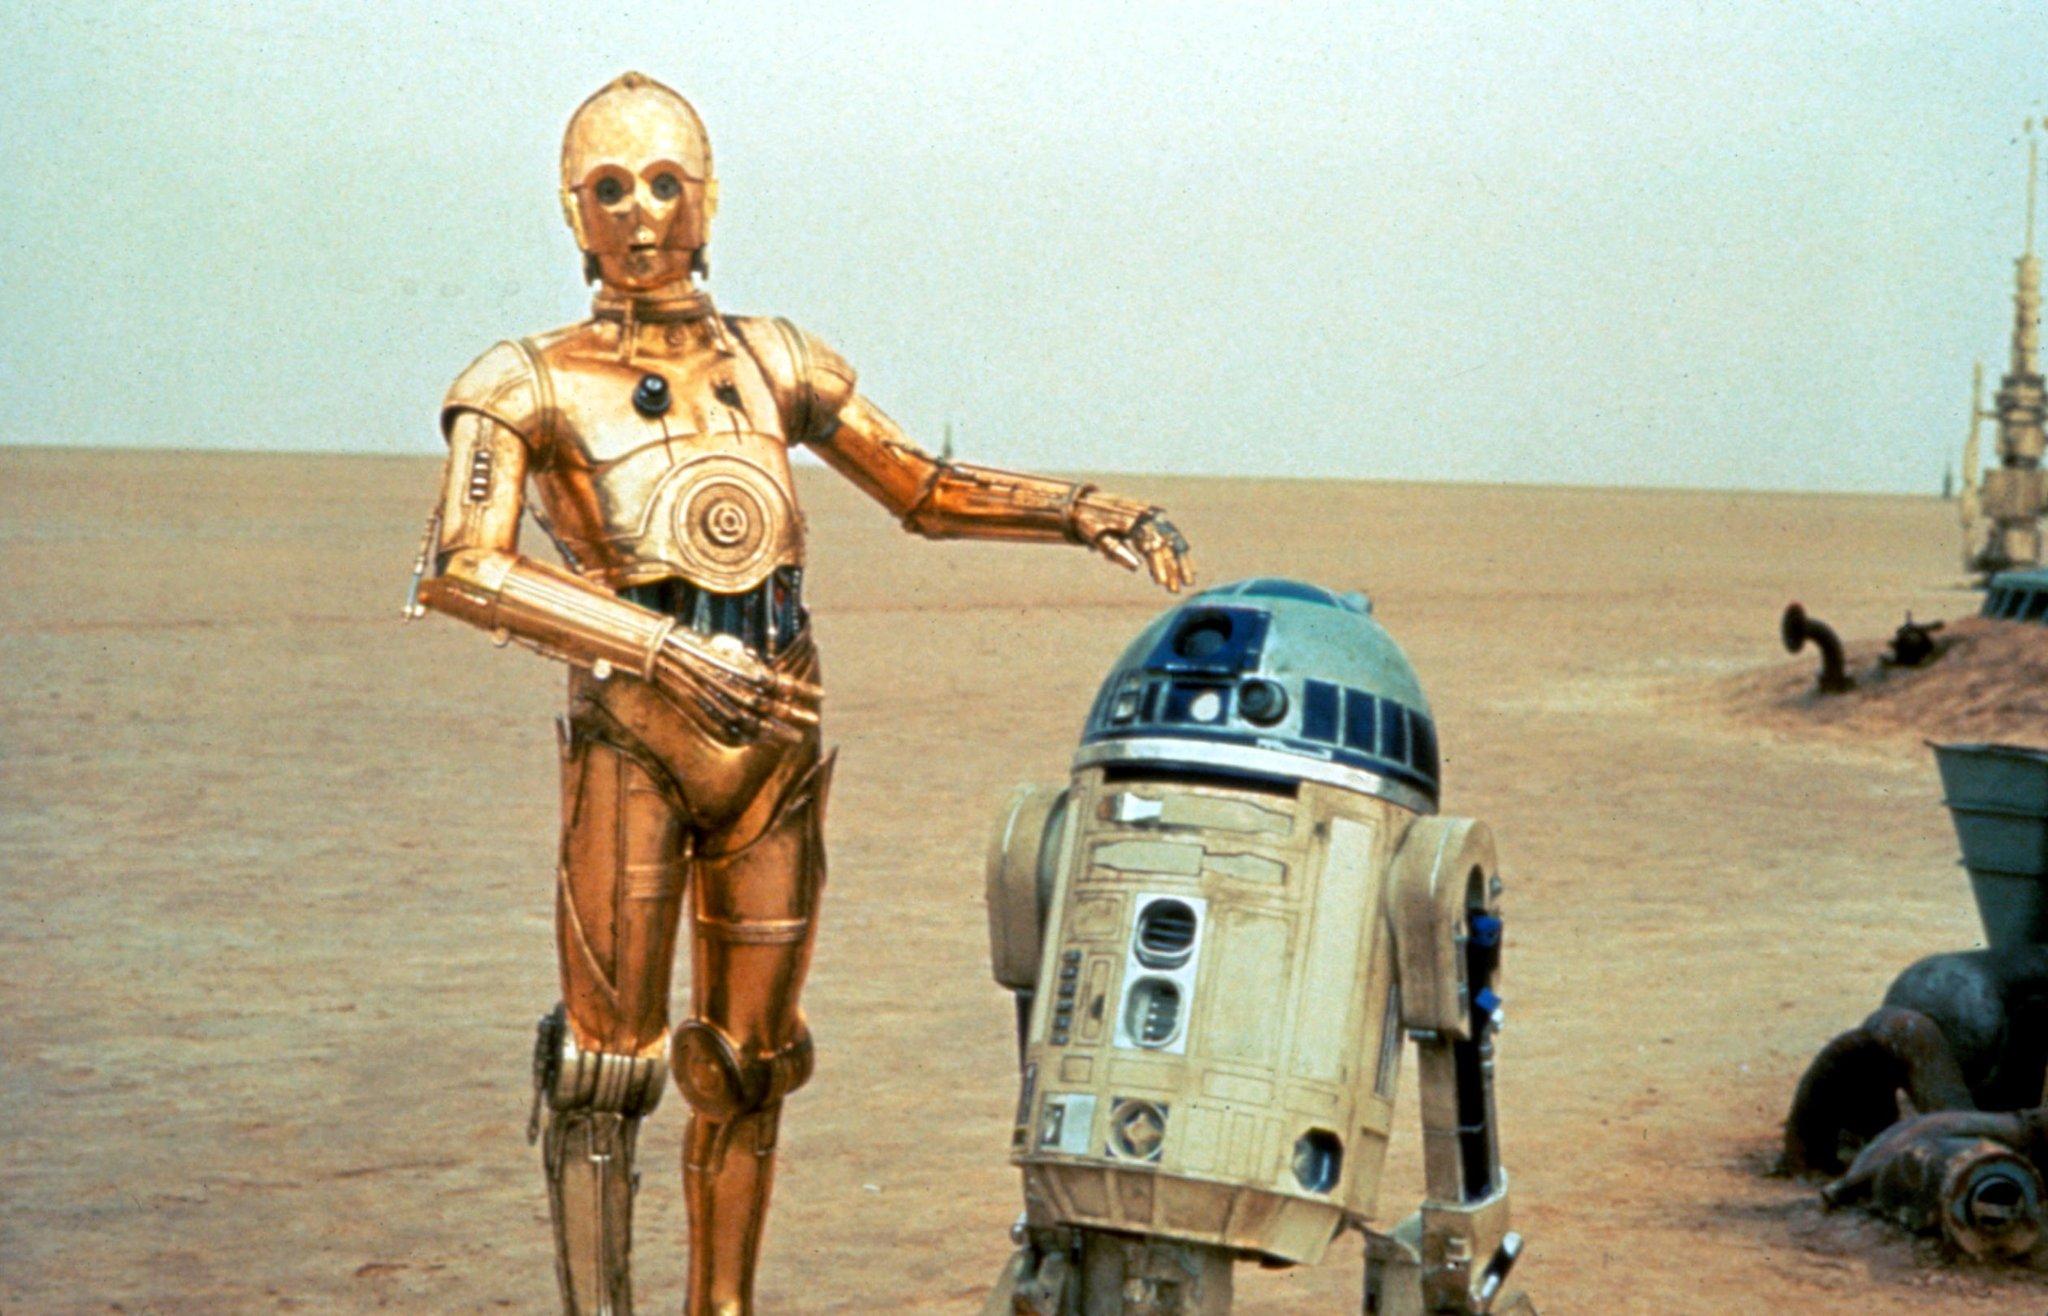 R2D2 - C3PO